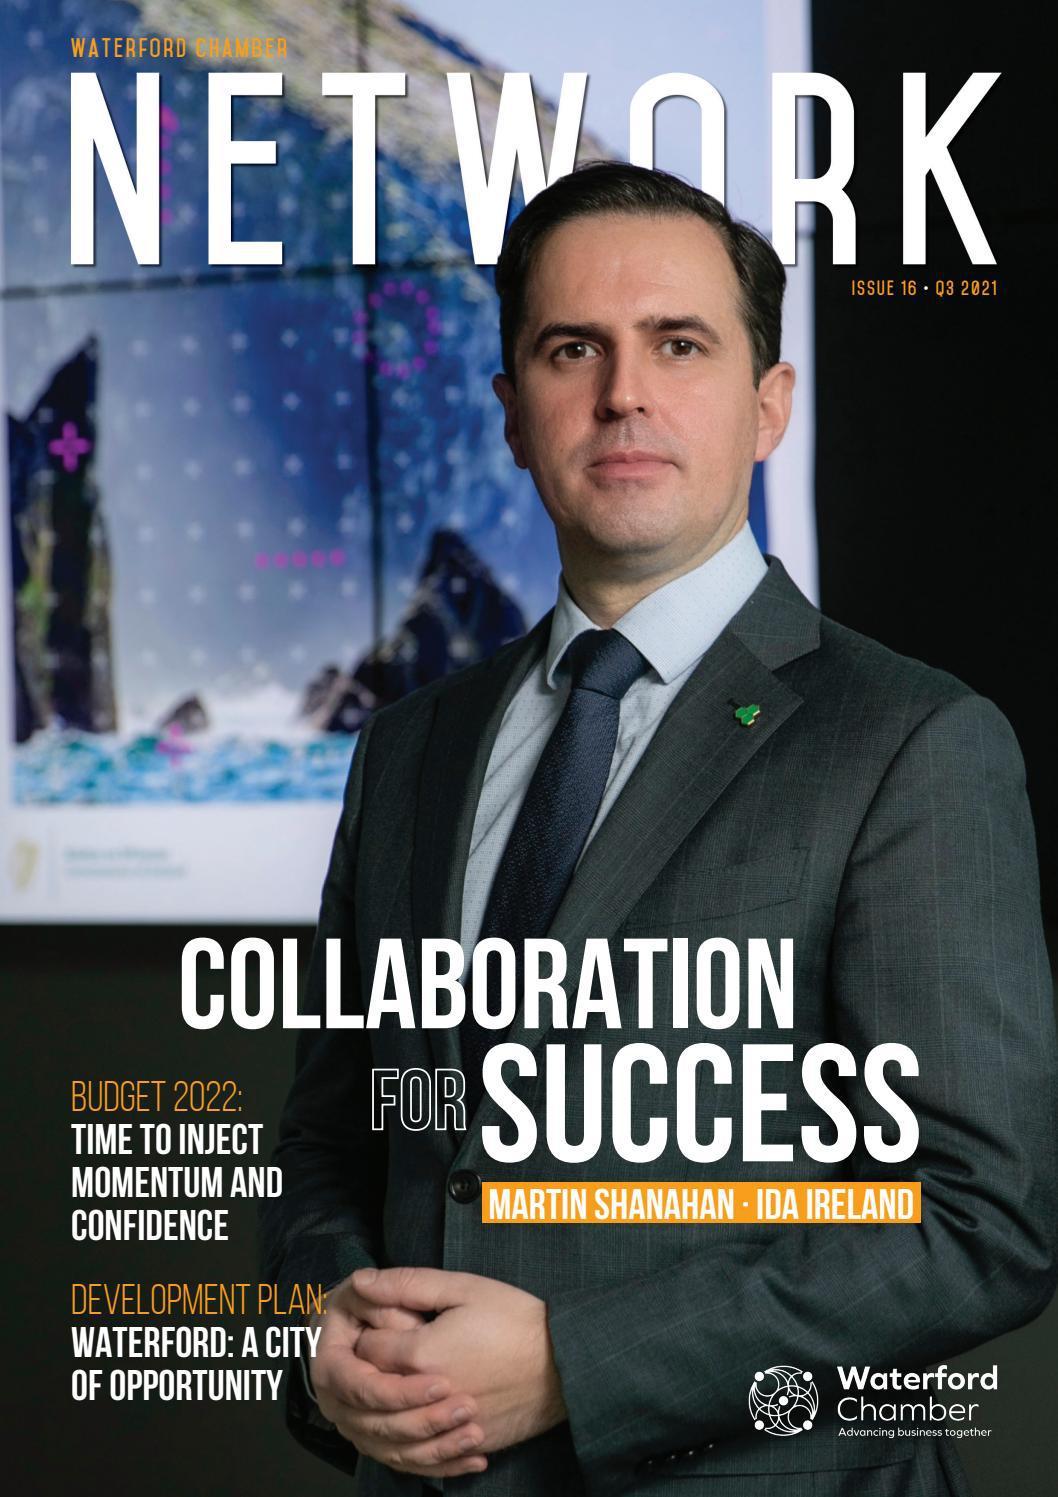 Network Magazine - Issue 16 - Q3 2021